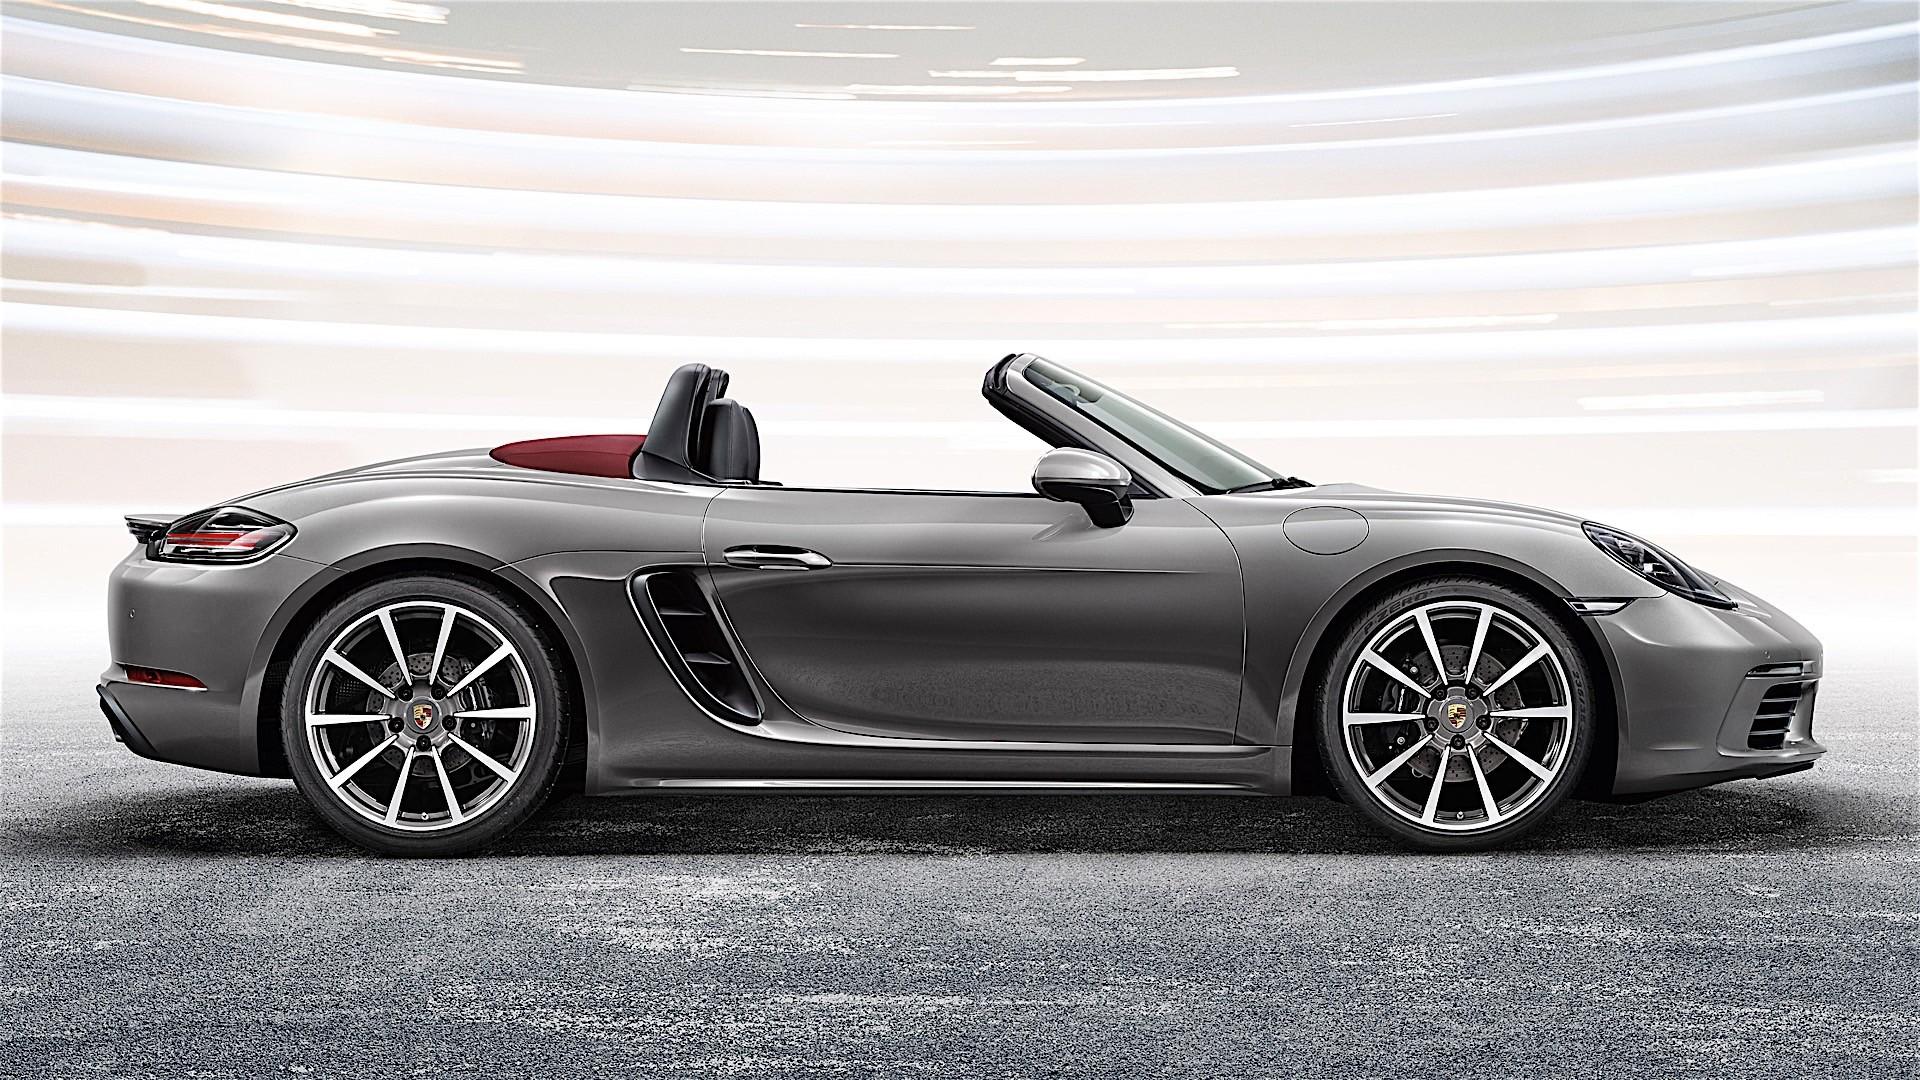 Porsche makes US$17k profit per vehicle, Ferrari US$90k